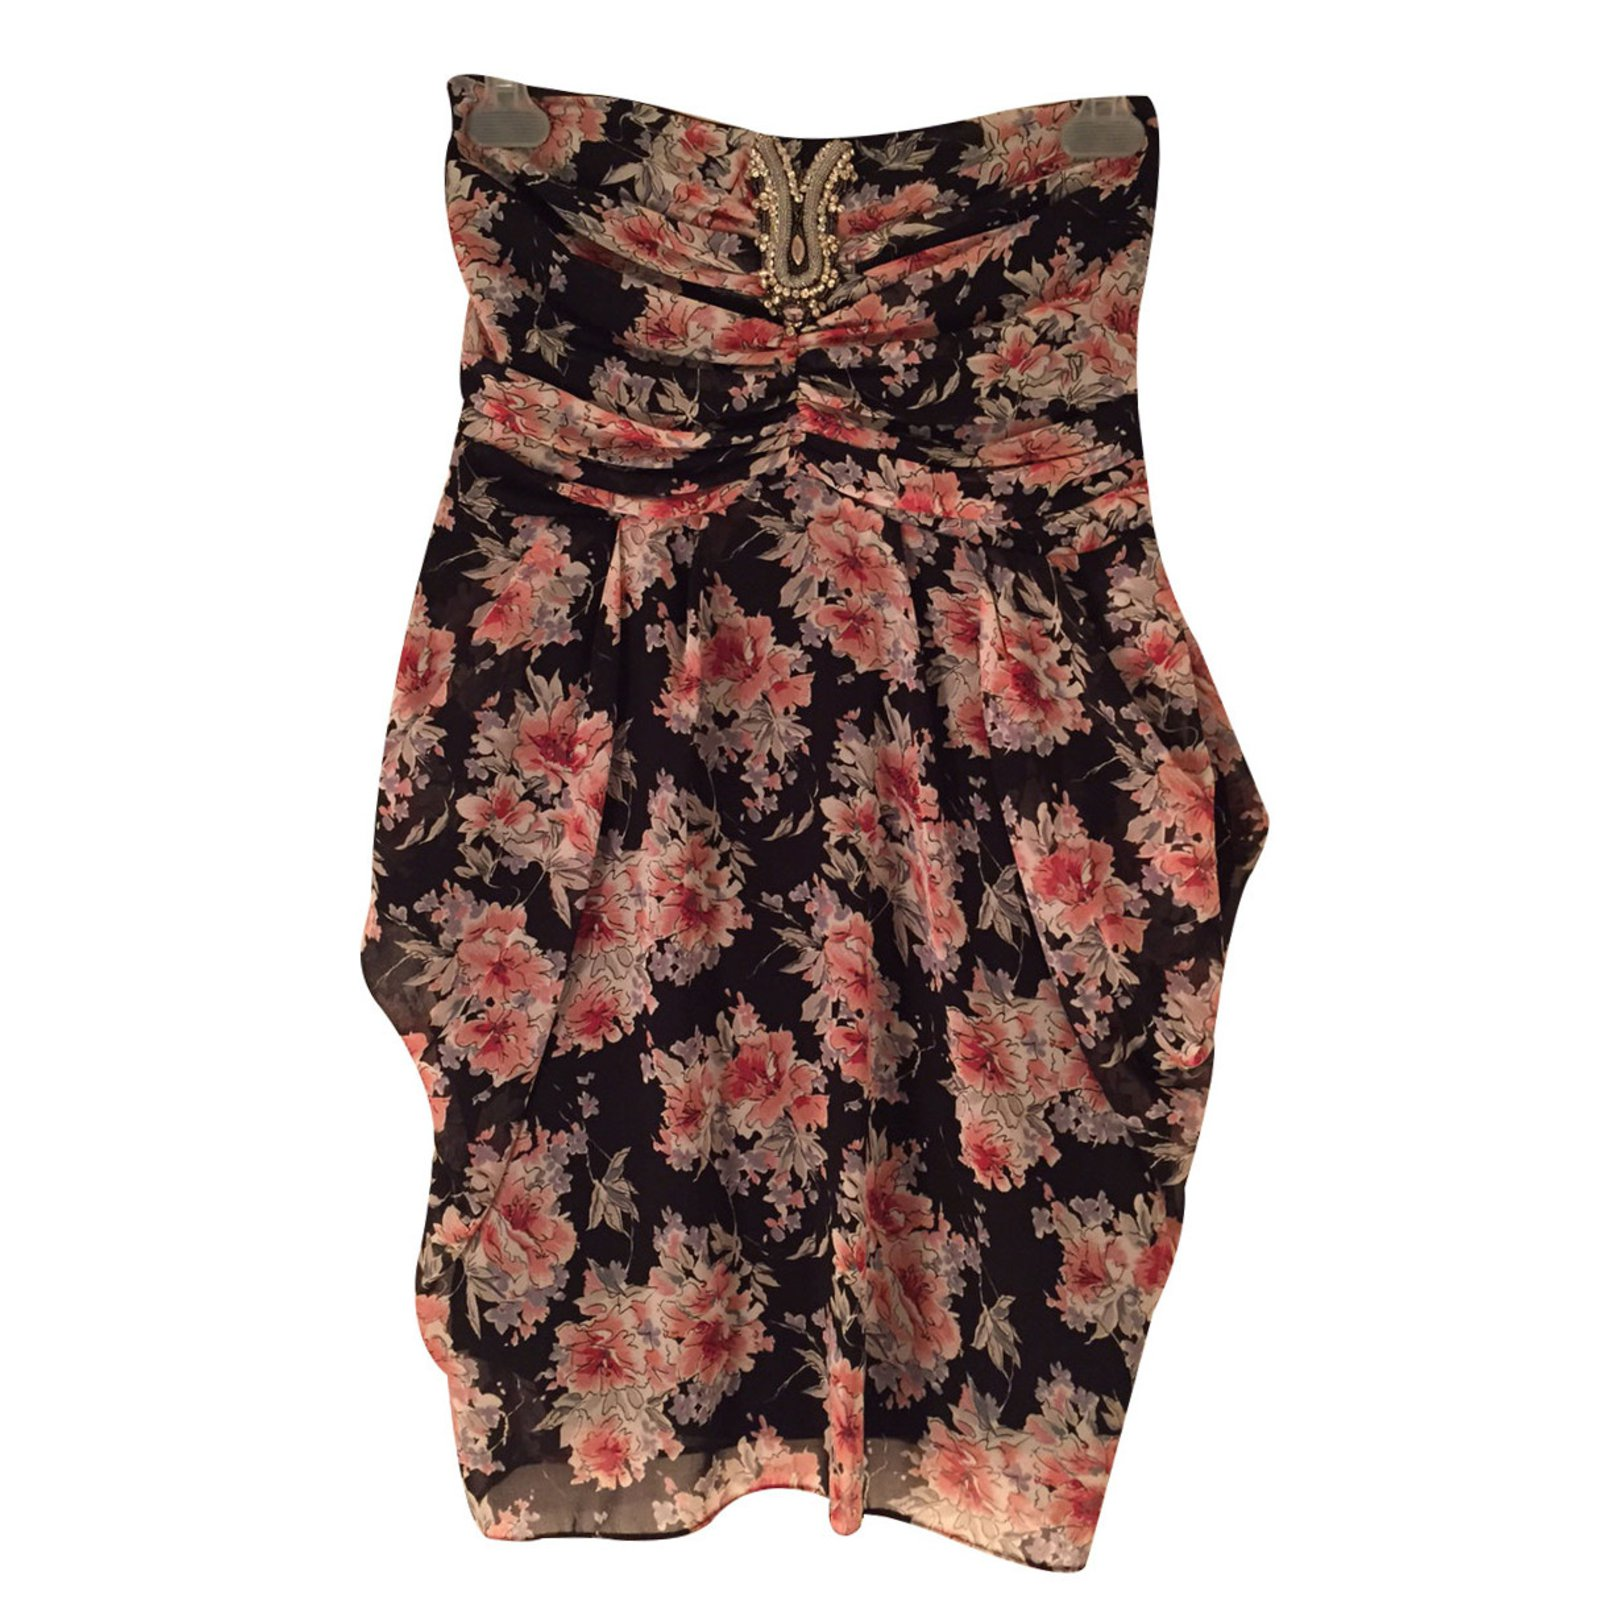 16418 Ref Bustier Sandro Closet Liberty Robes Joli Soie Robe xXq6wY7U